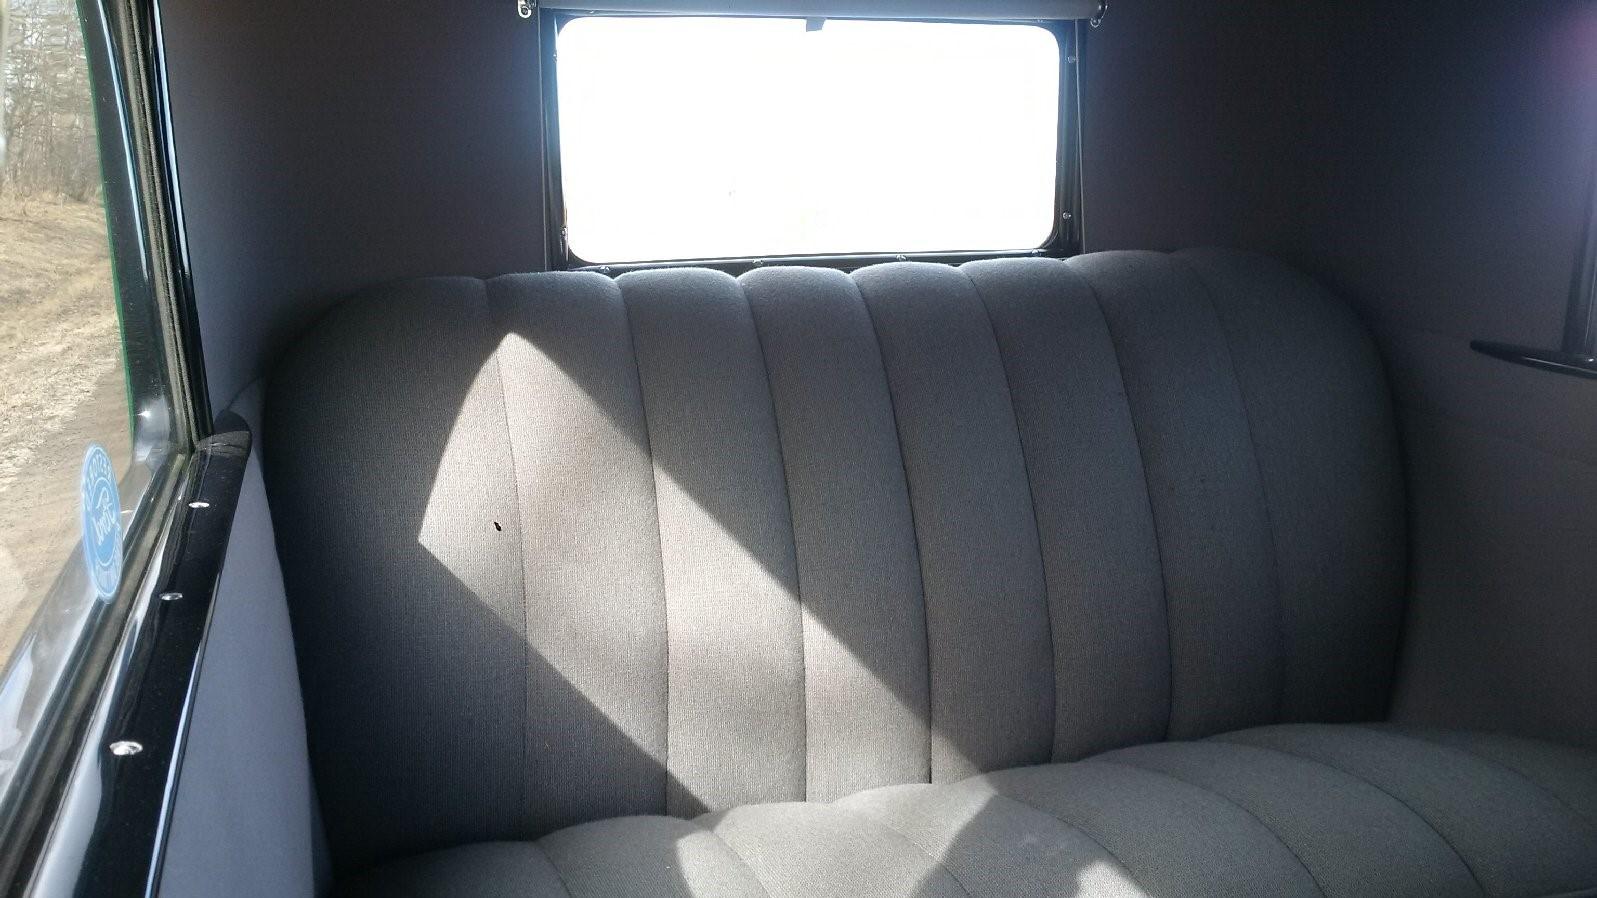 1928 Tudor Back seat view